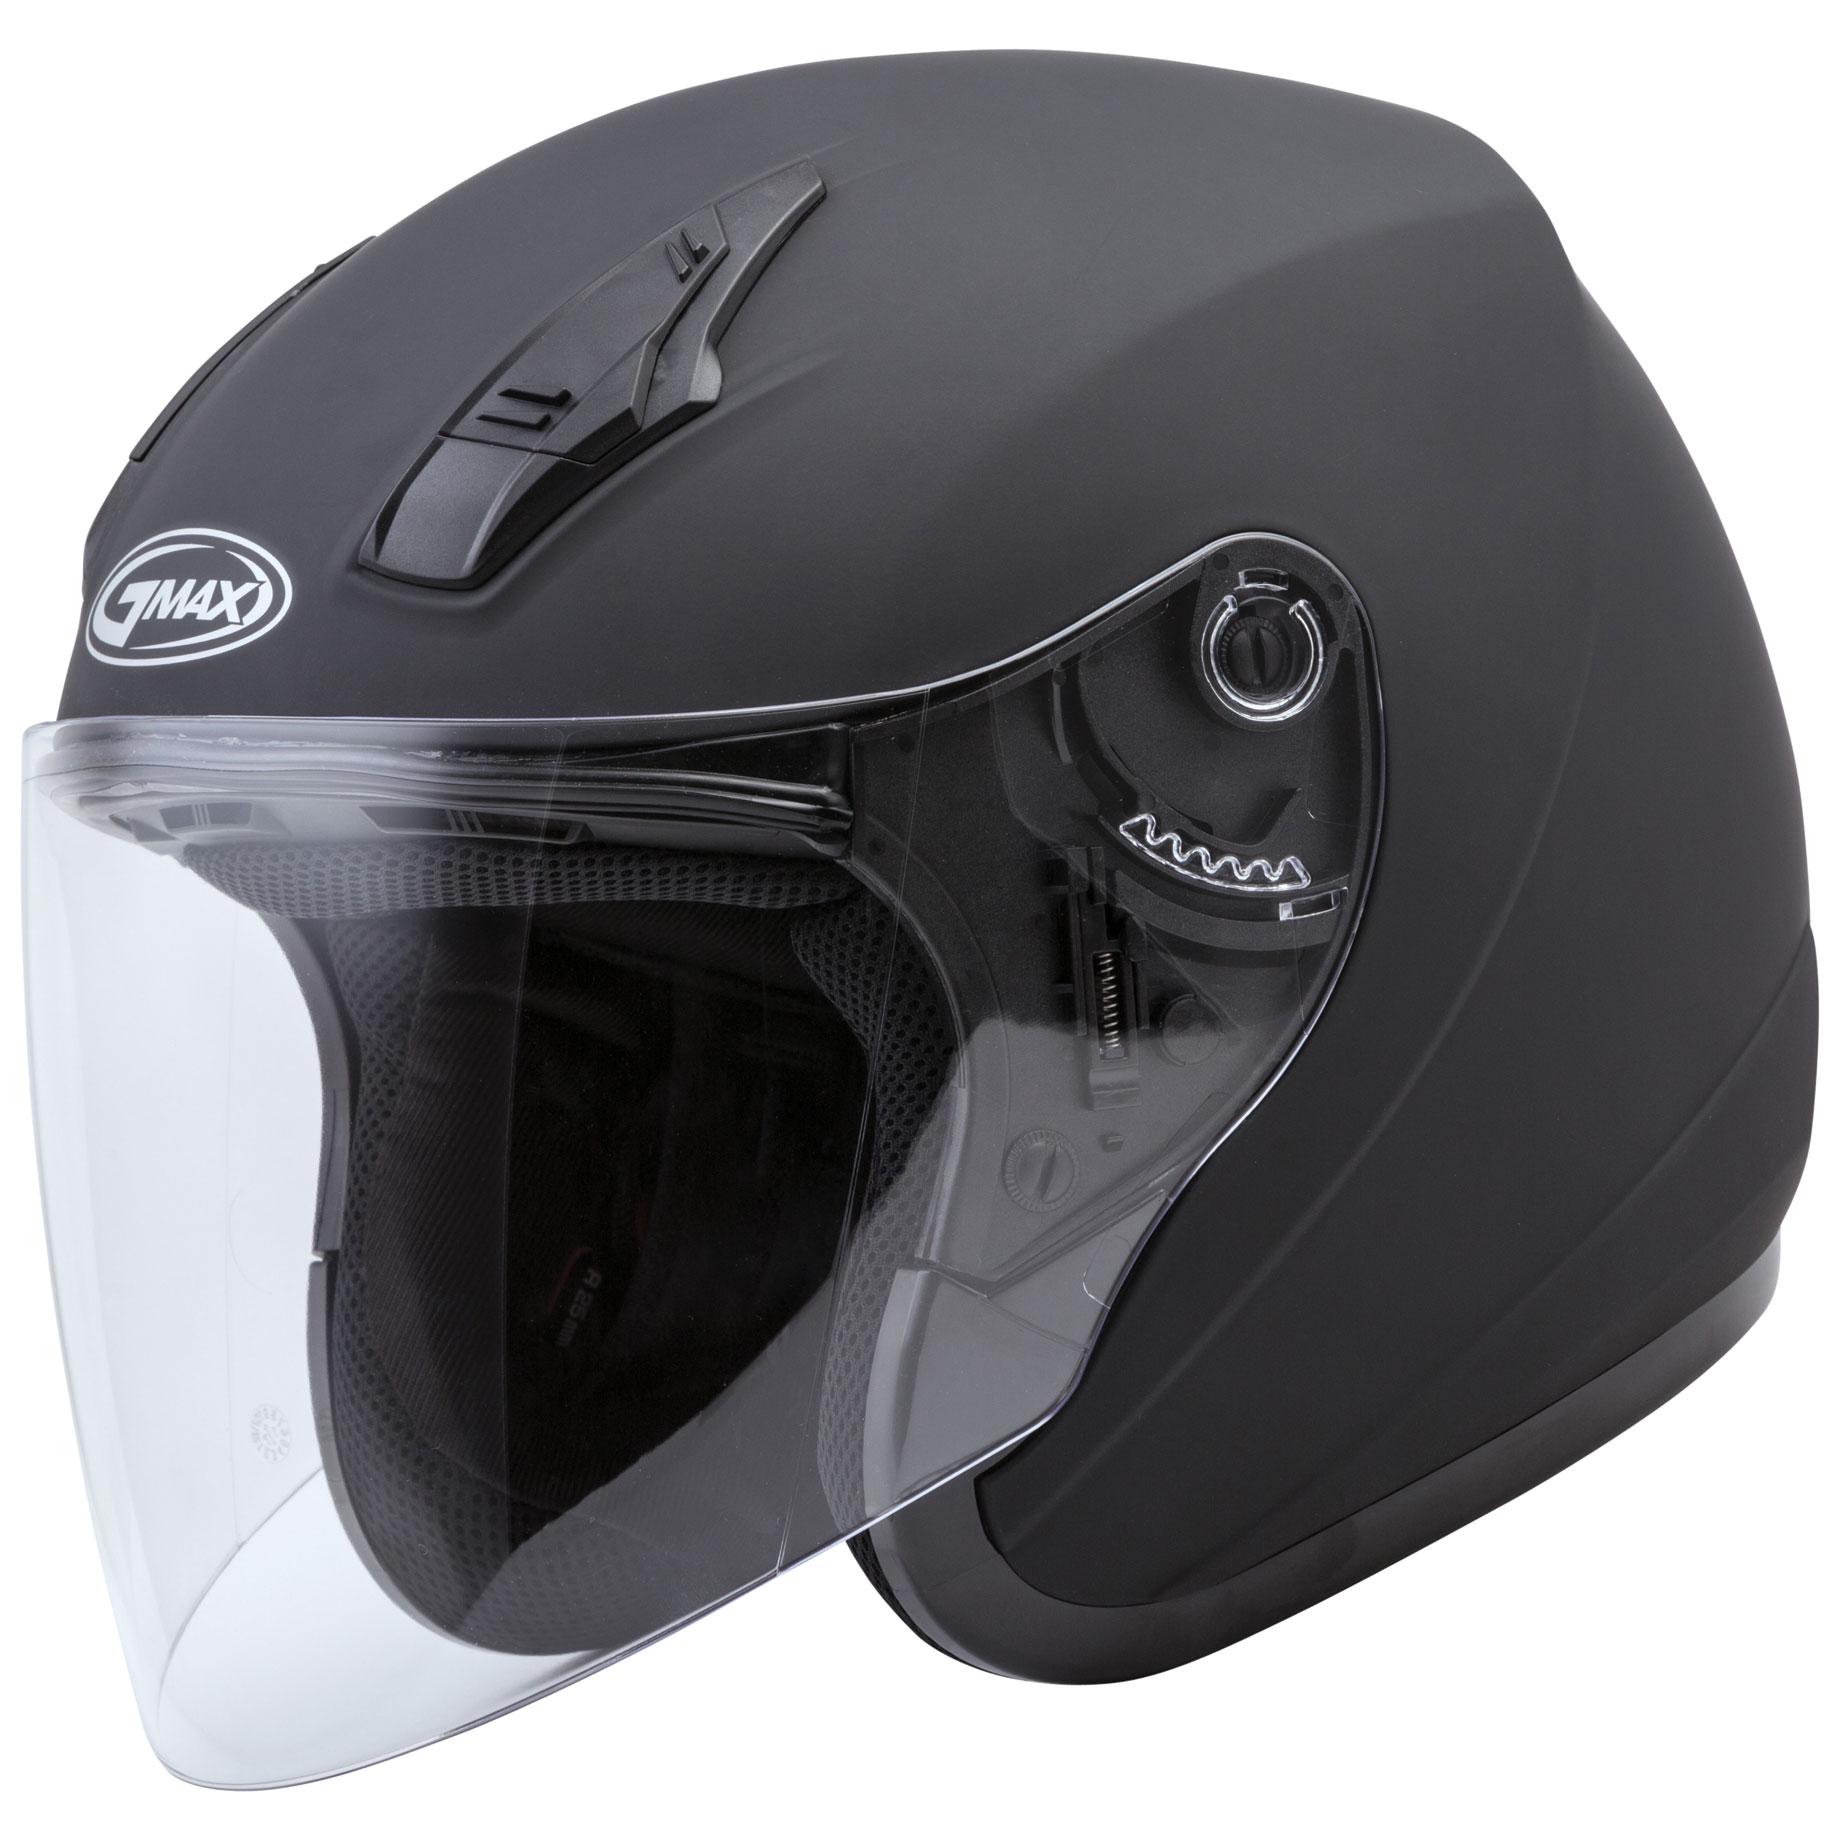 GMAX OF17 Matte Black Open Face Helmet